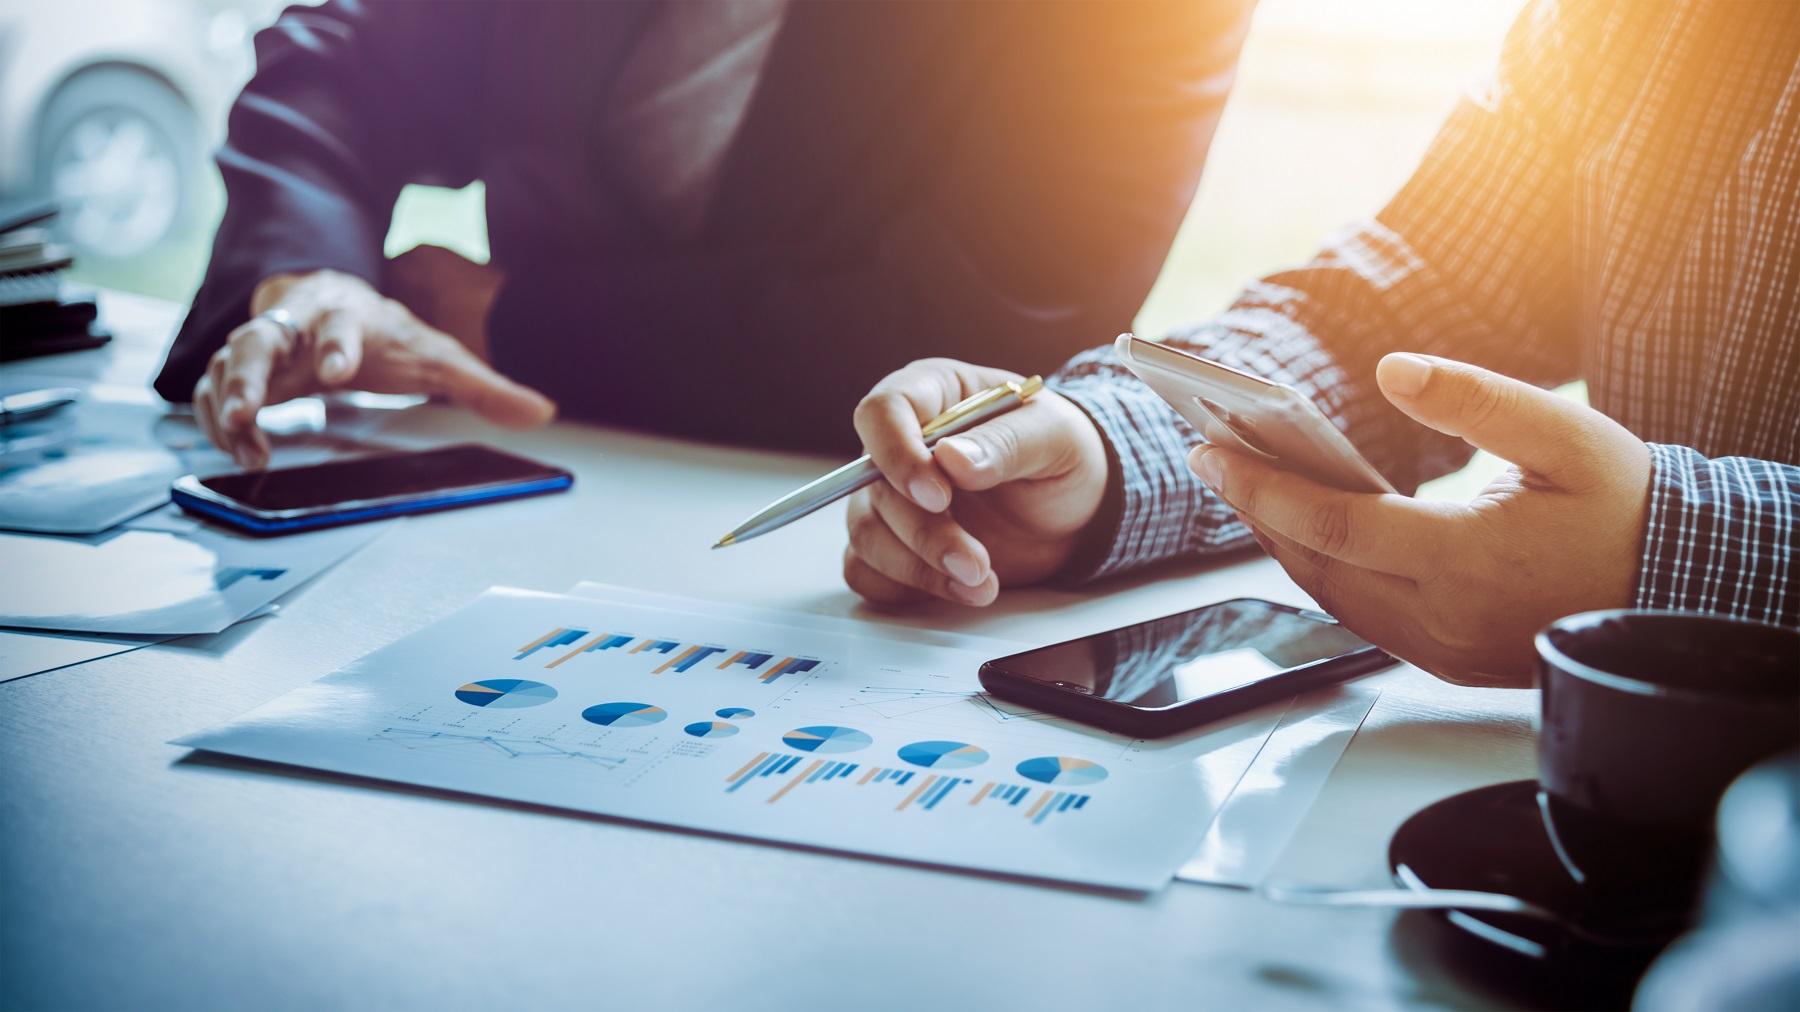 Continutul relevant este un instrument de marketing online care genereaza new business